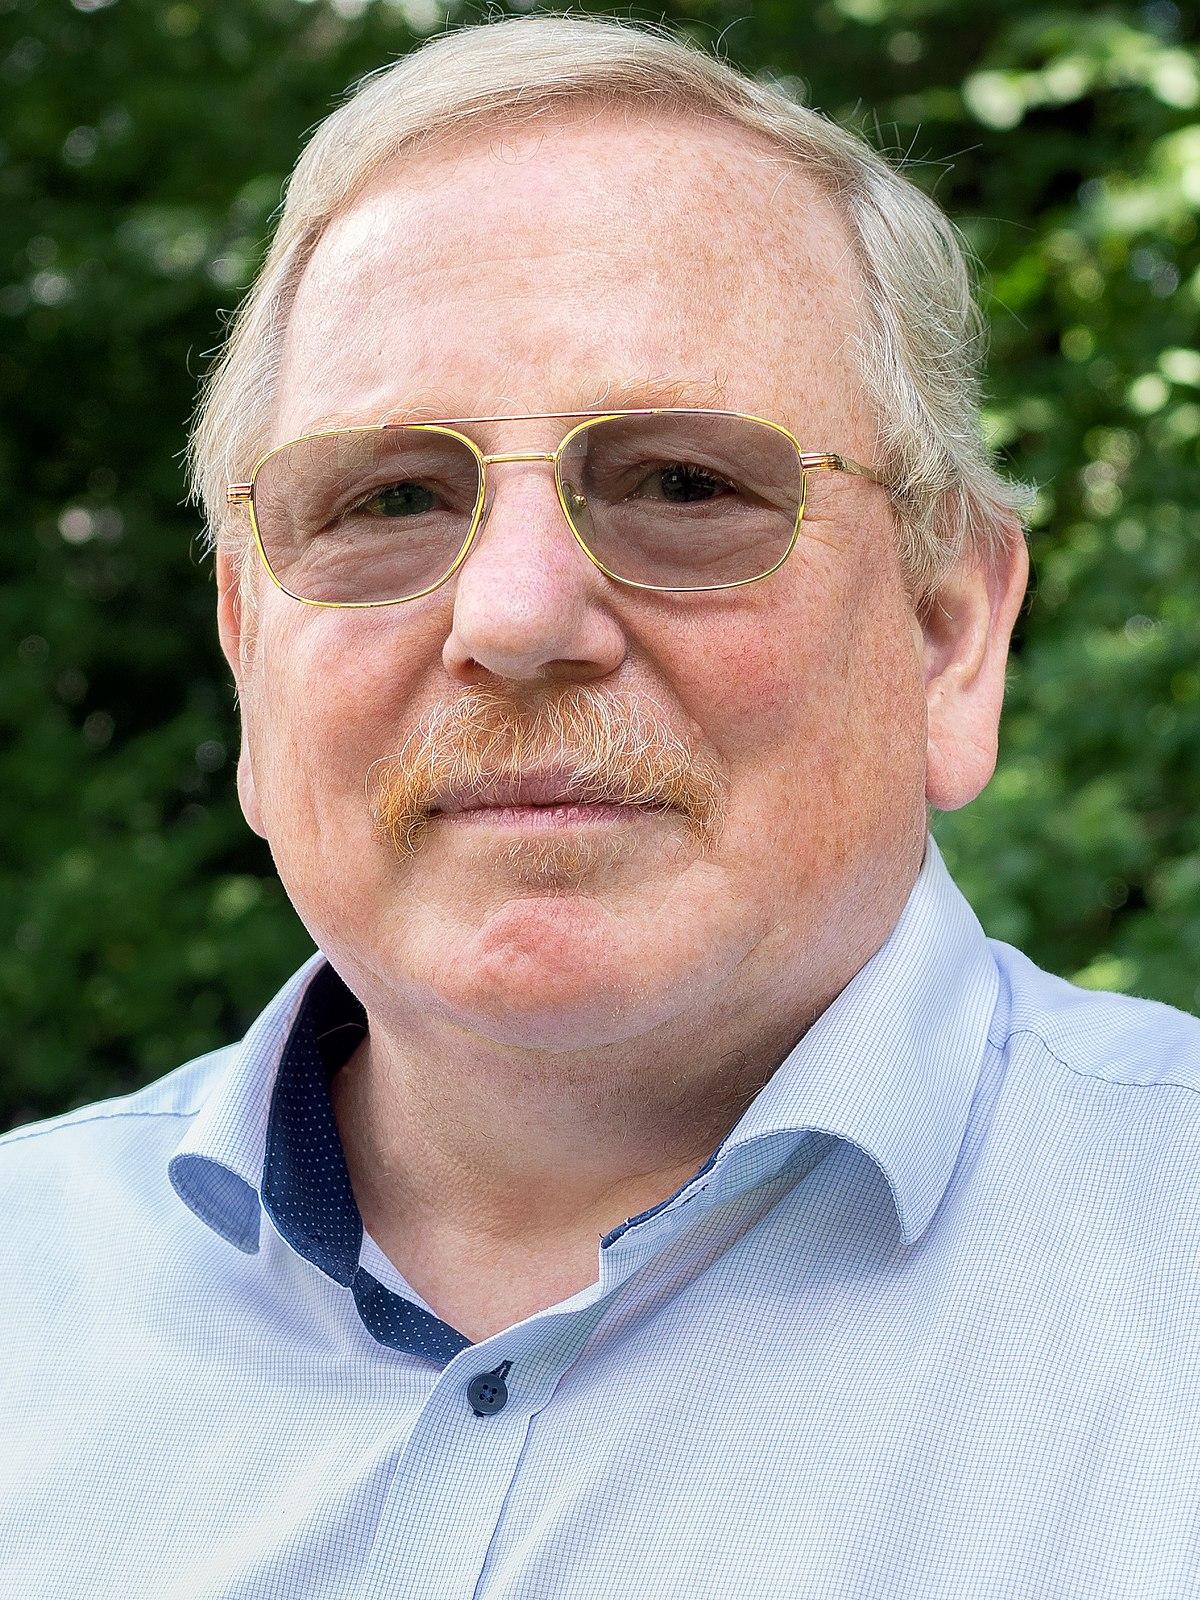 Reinhard Genzel - Simple English Wikipedia, the free ...